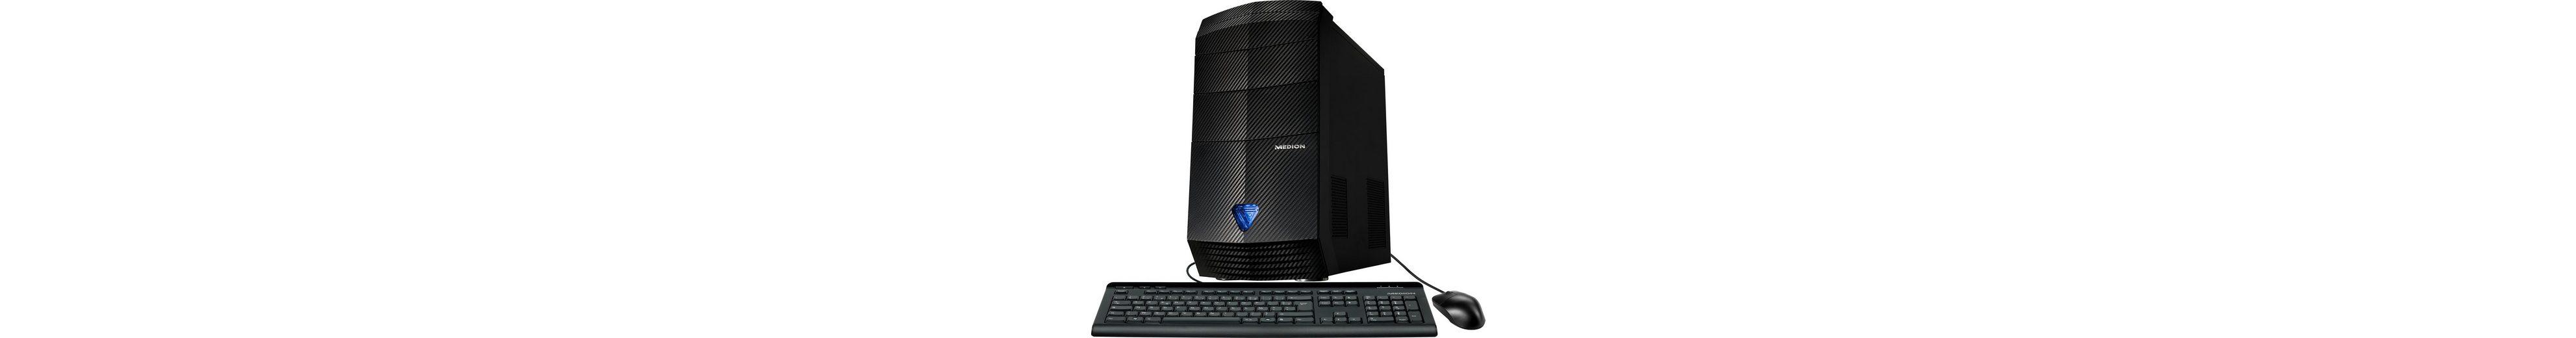 Medion® AKOYA S91-B781 PC, Intel® Pentium™, 8192 MB DDR3-RAM, 1000 GB Speicher